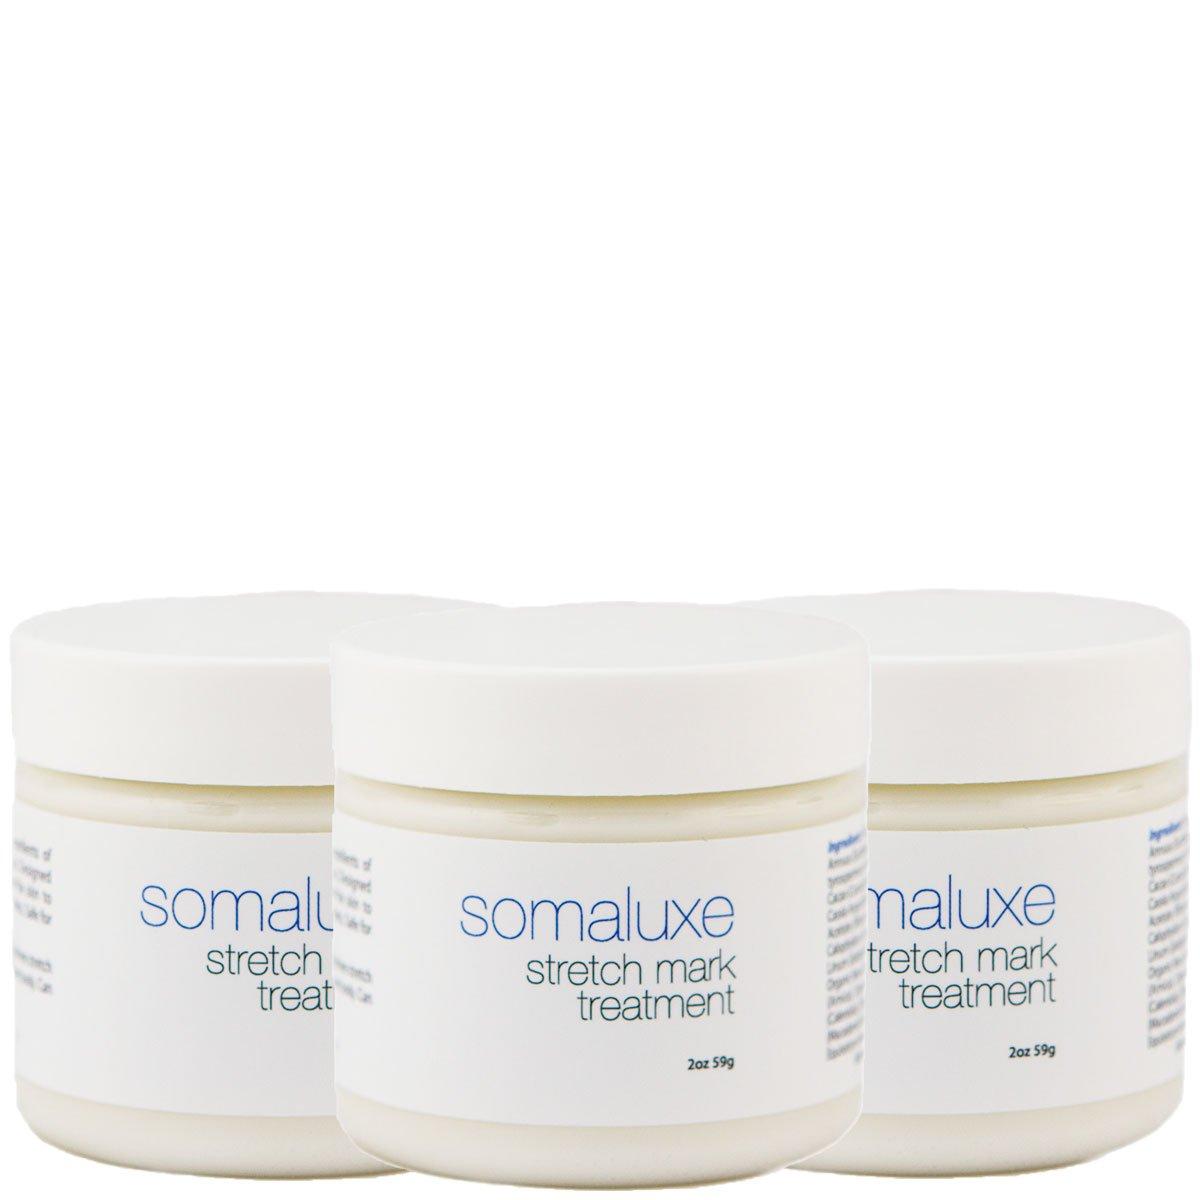 Organic Stretch Mark Cream - Safe for Pregnant Women, 2oz (3 Pack)